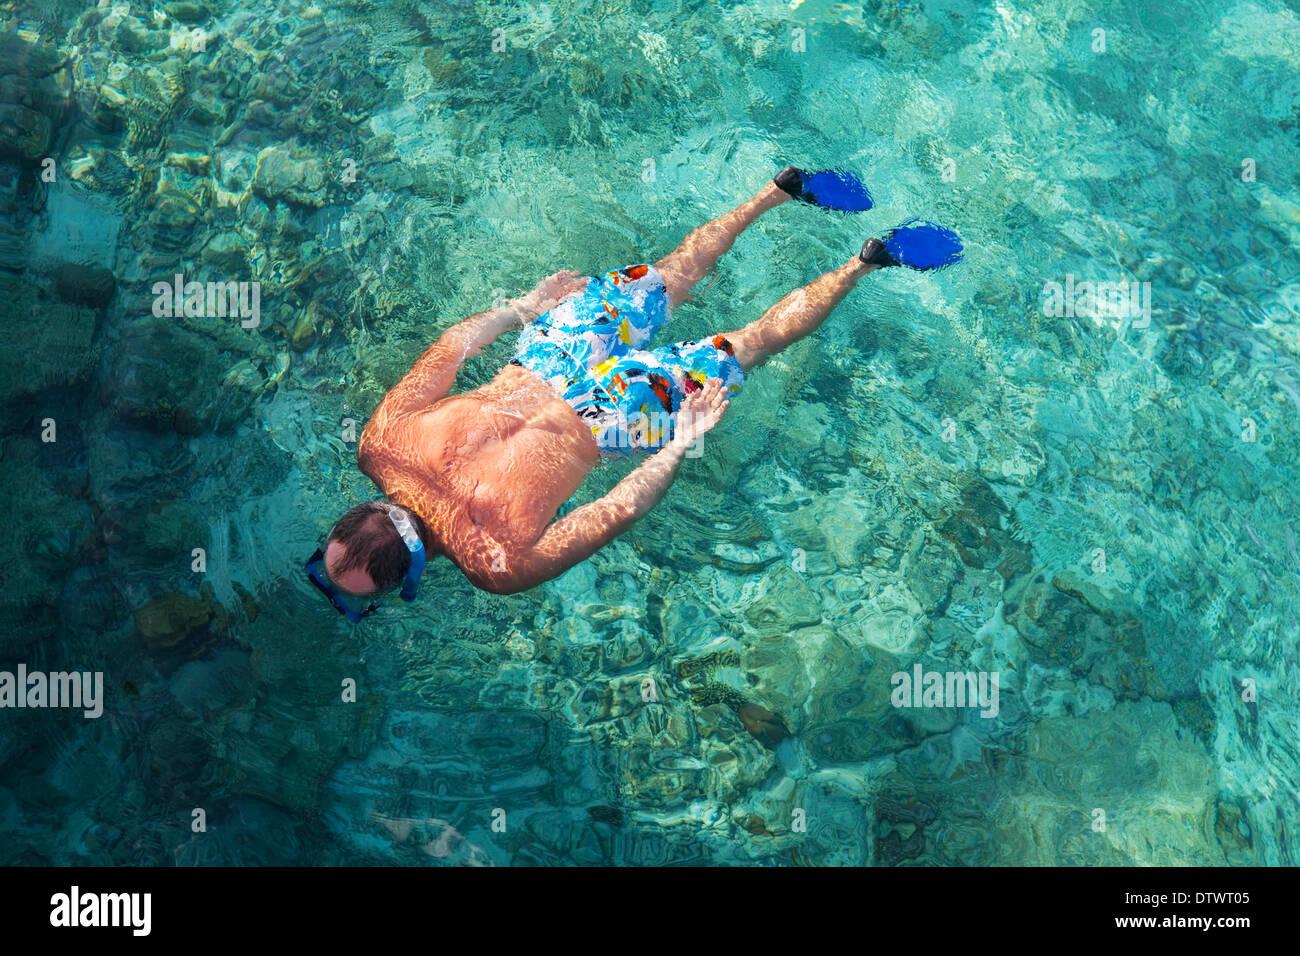 Snorkeling - Stock Image